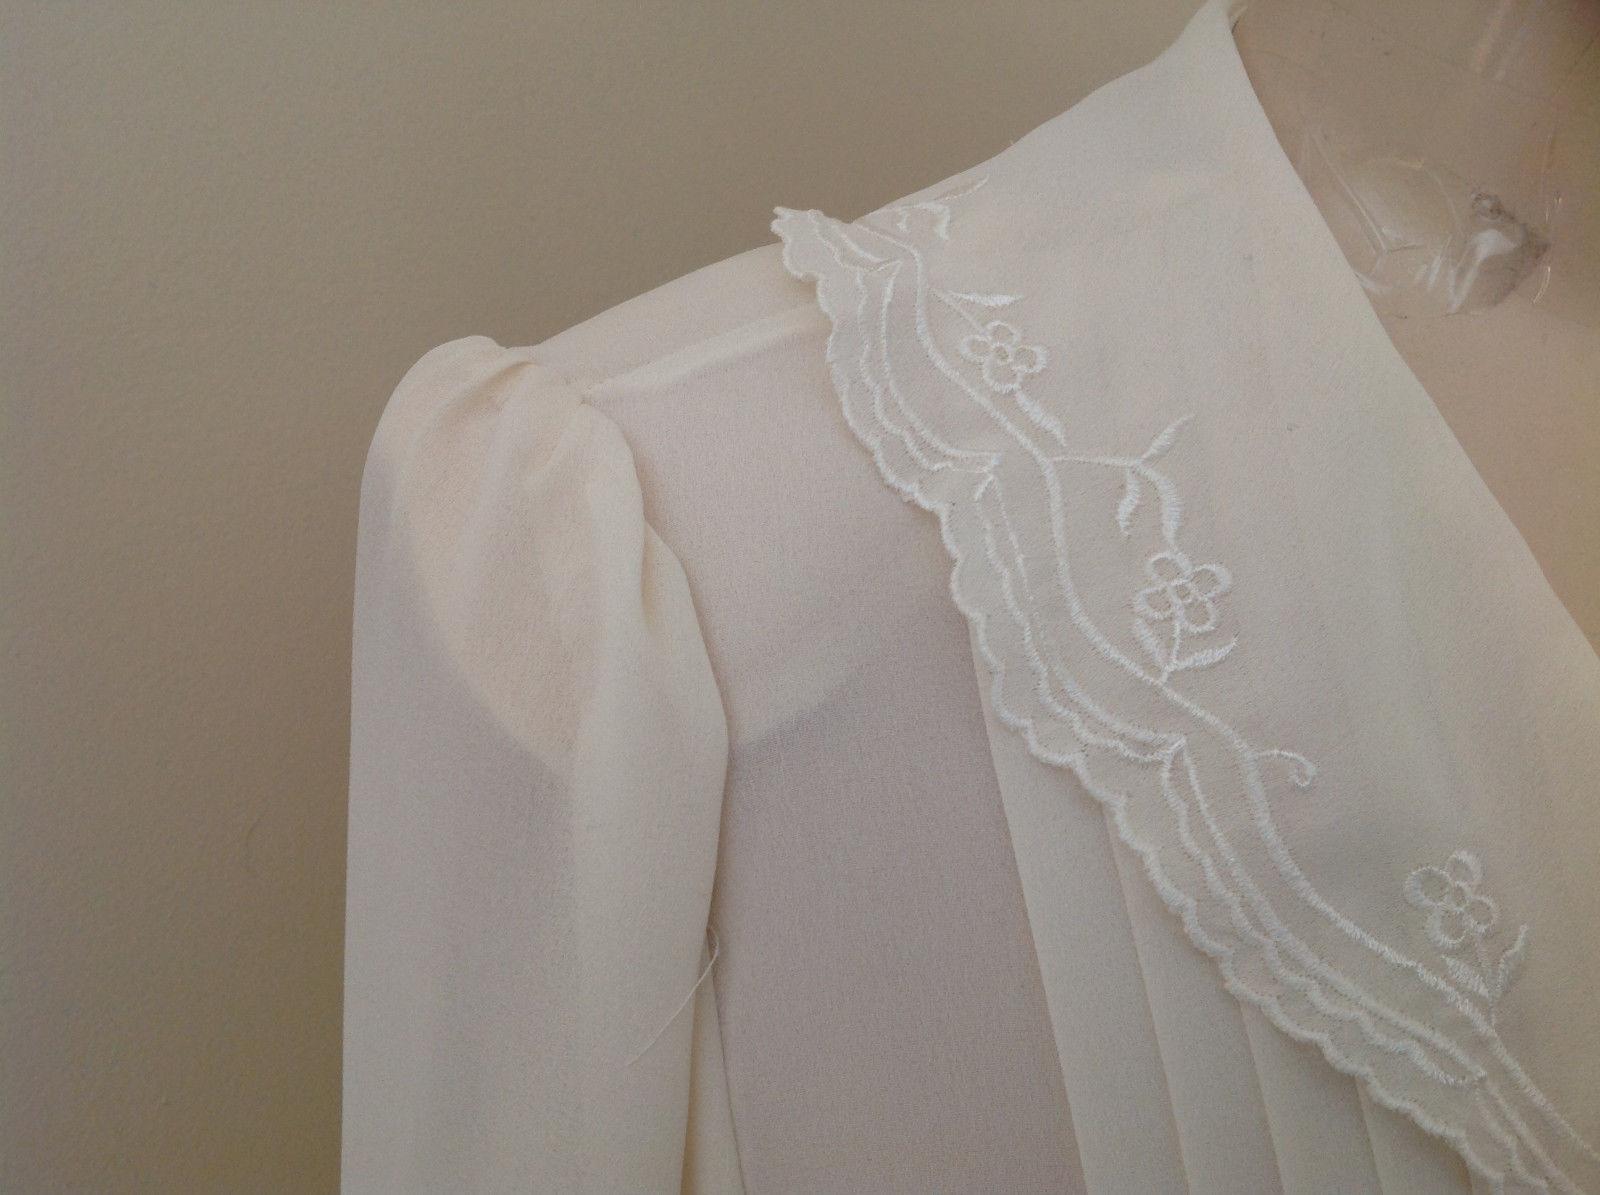 Karen Scott Cream Lace Collared Pleated Design Chiffon Top Made in Korea Size 10